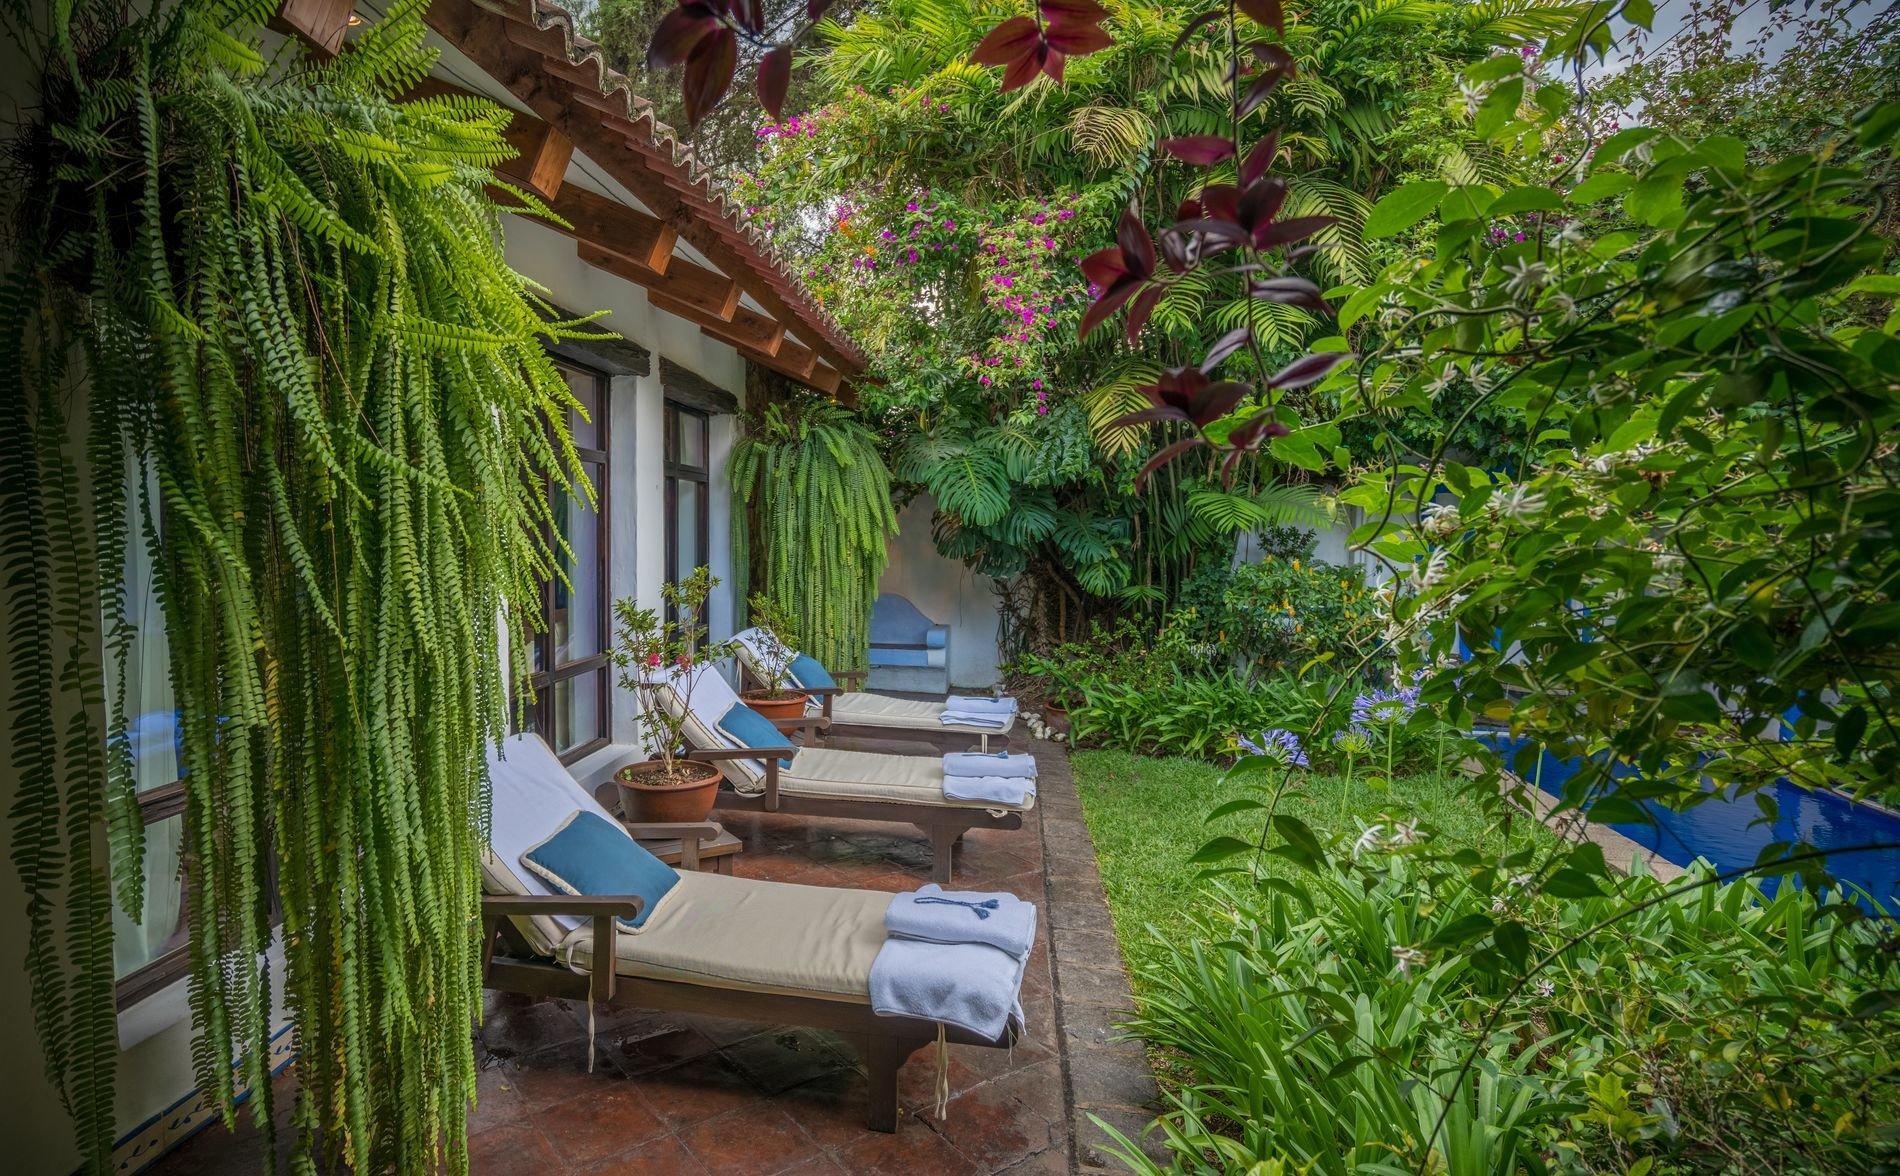 Hotel Casa Encantada Hotel Boutique Antigua Guatemala